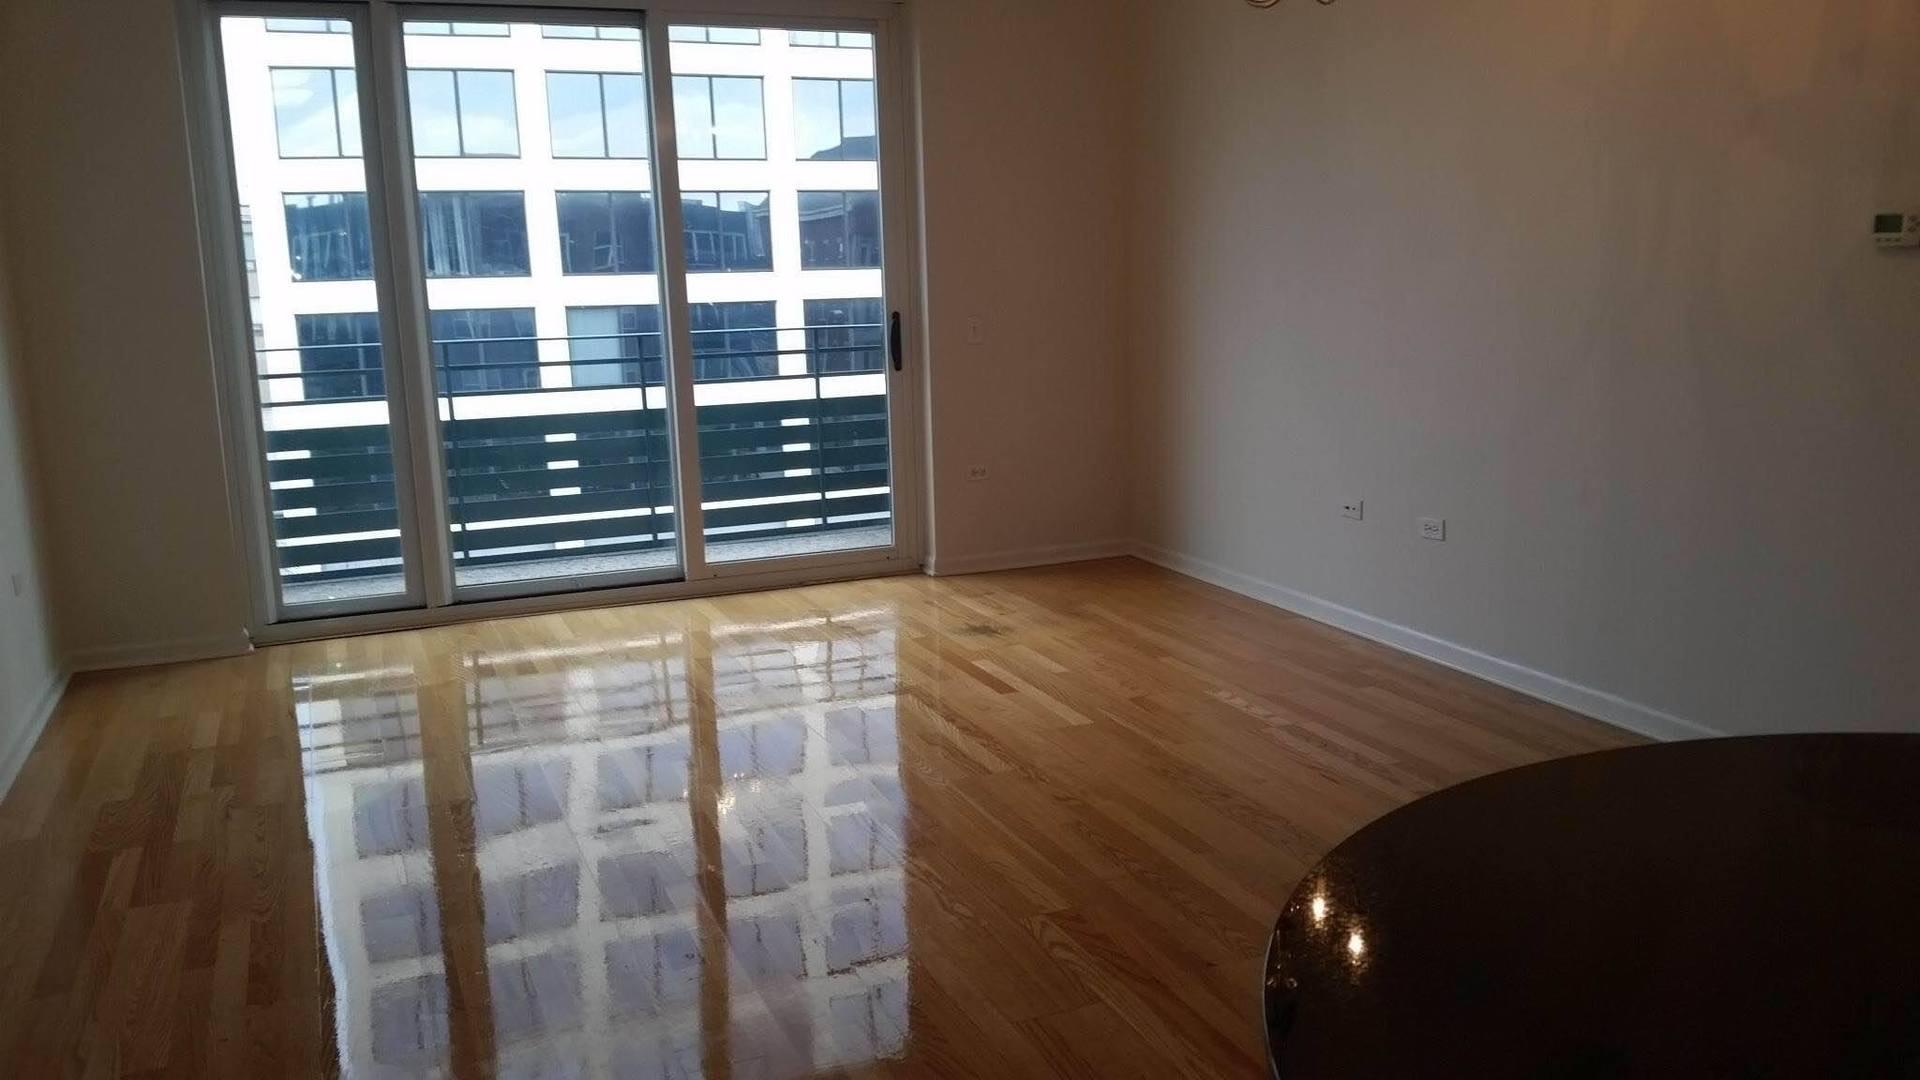 17 W 35th St apartments for rent at AptAmigo